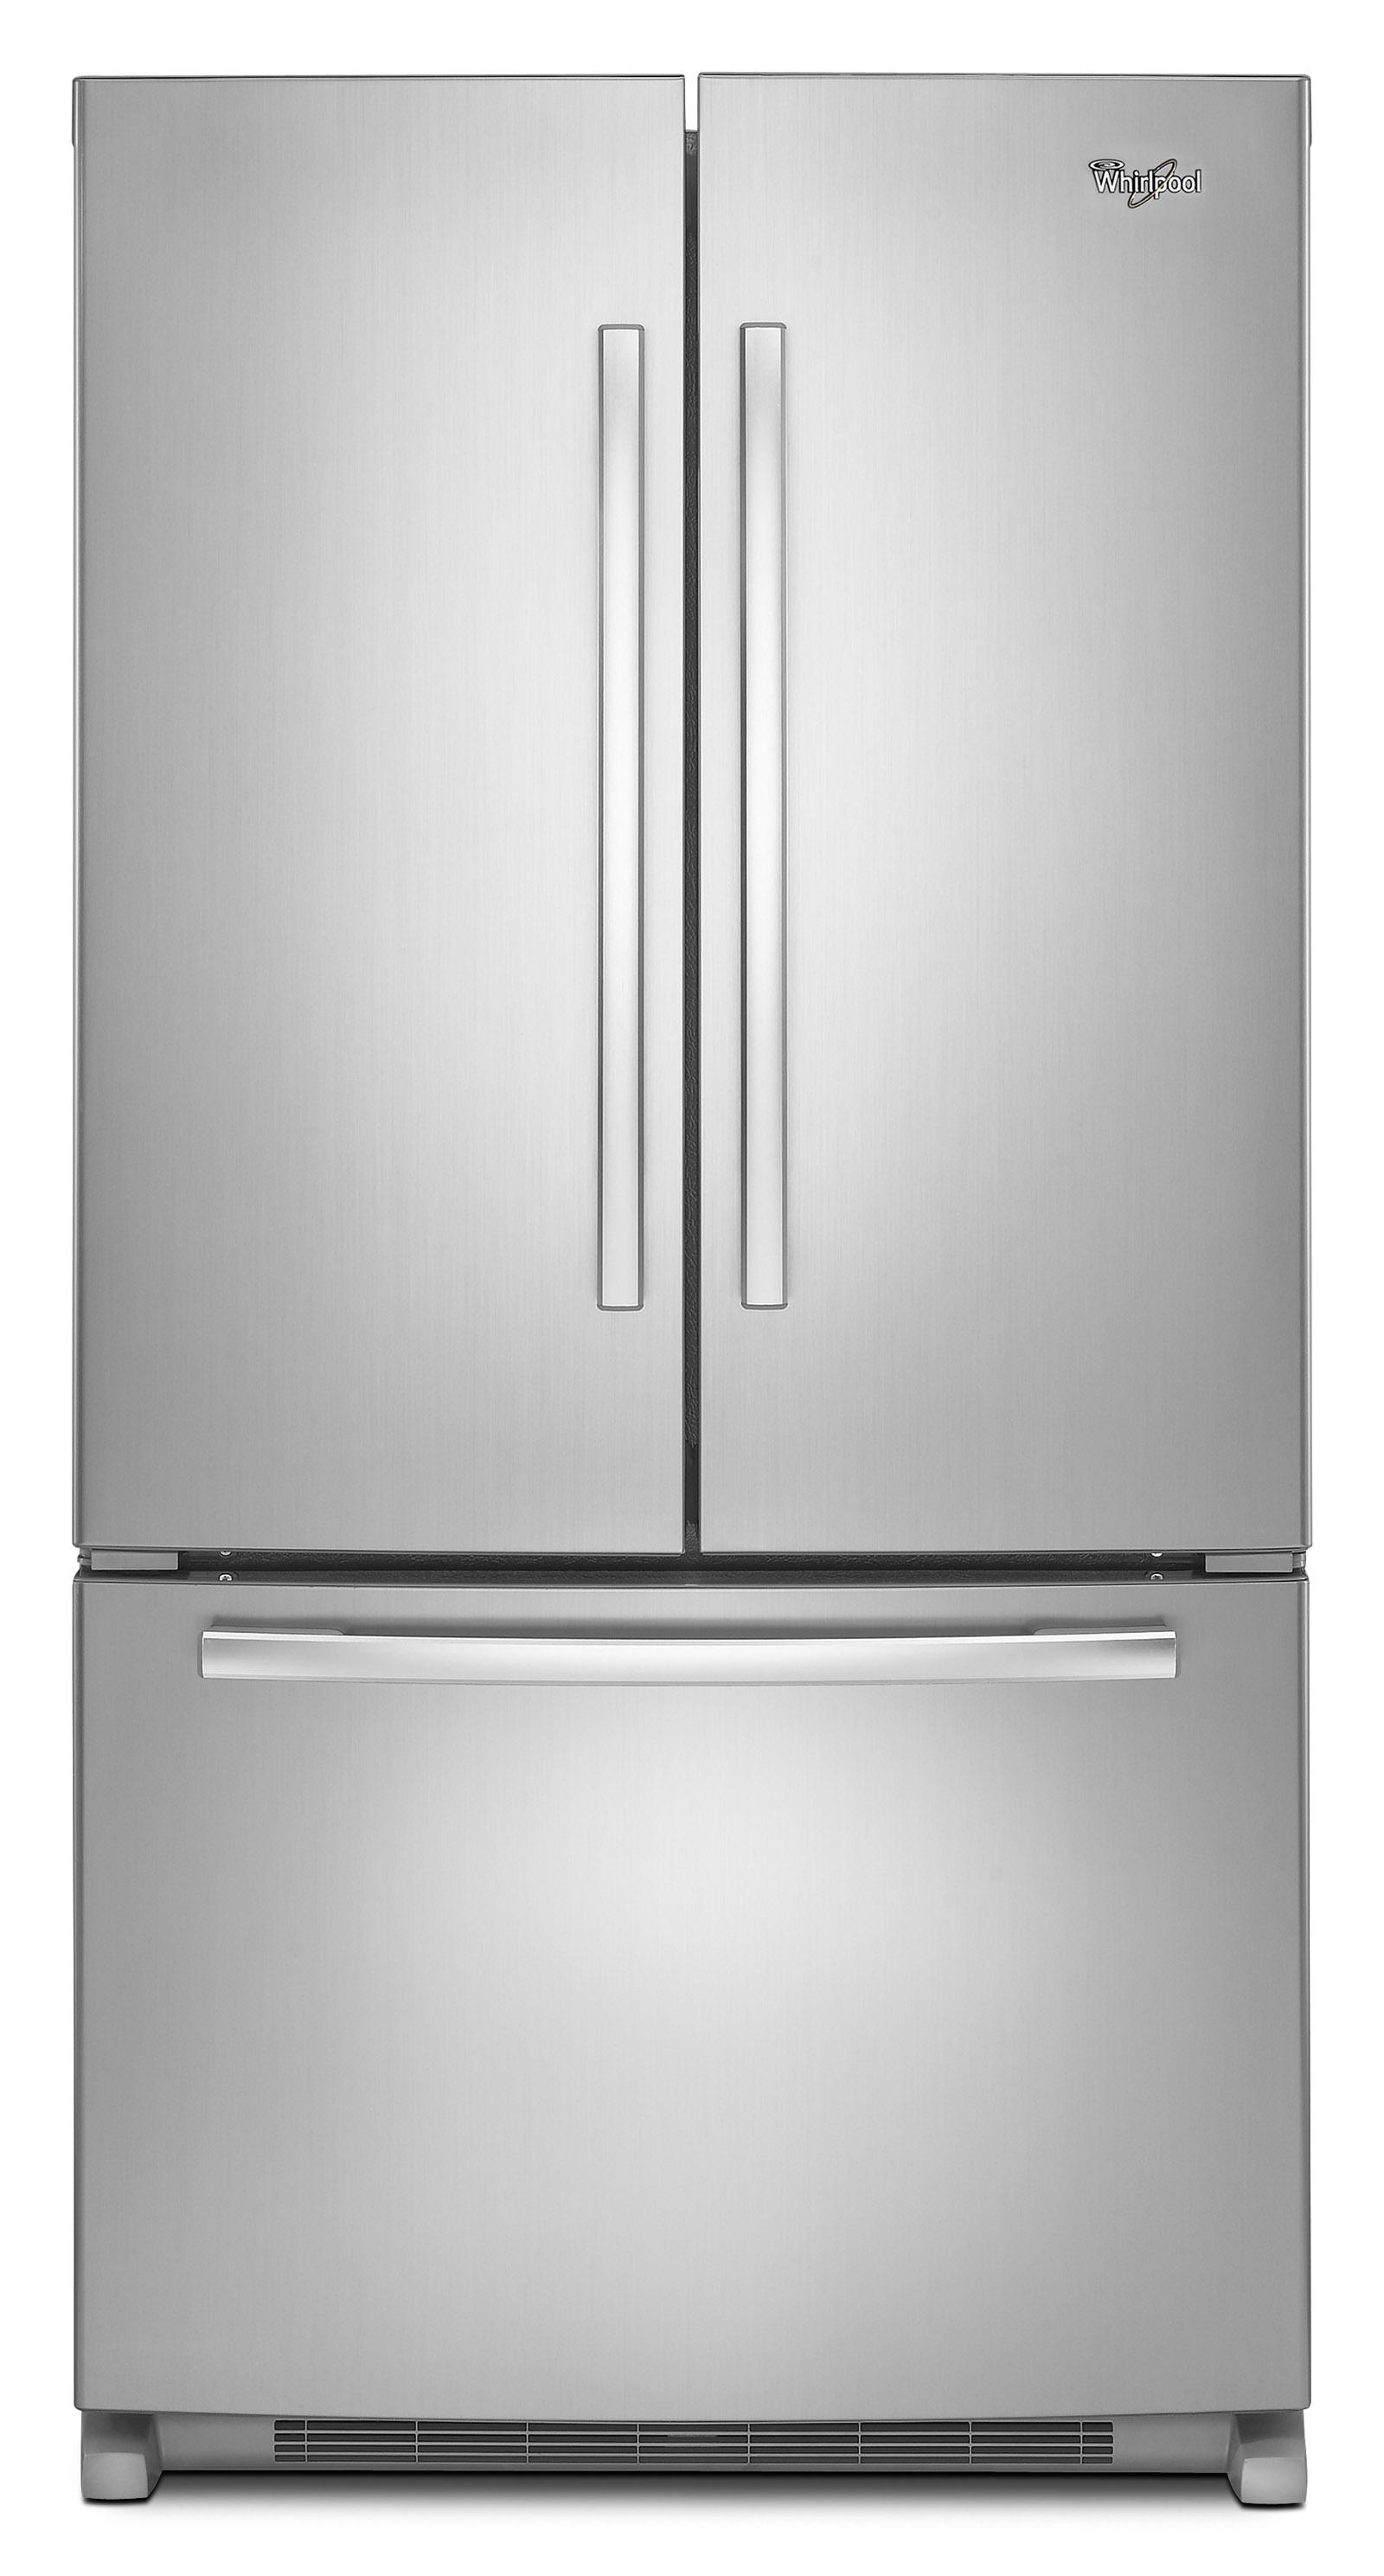 Whirlpool Wrf535swbm Wide French Door Refrigerator With